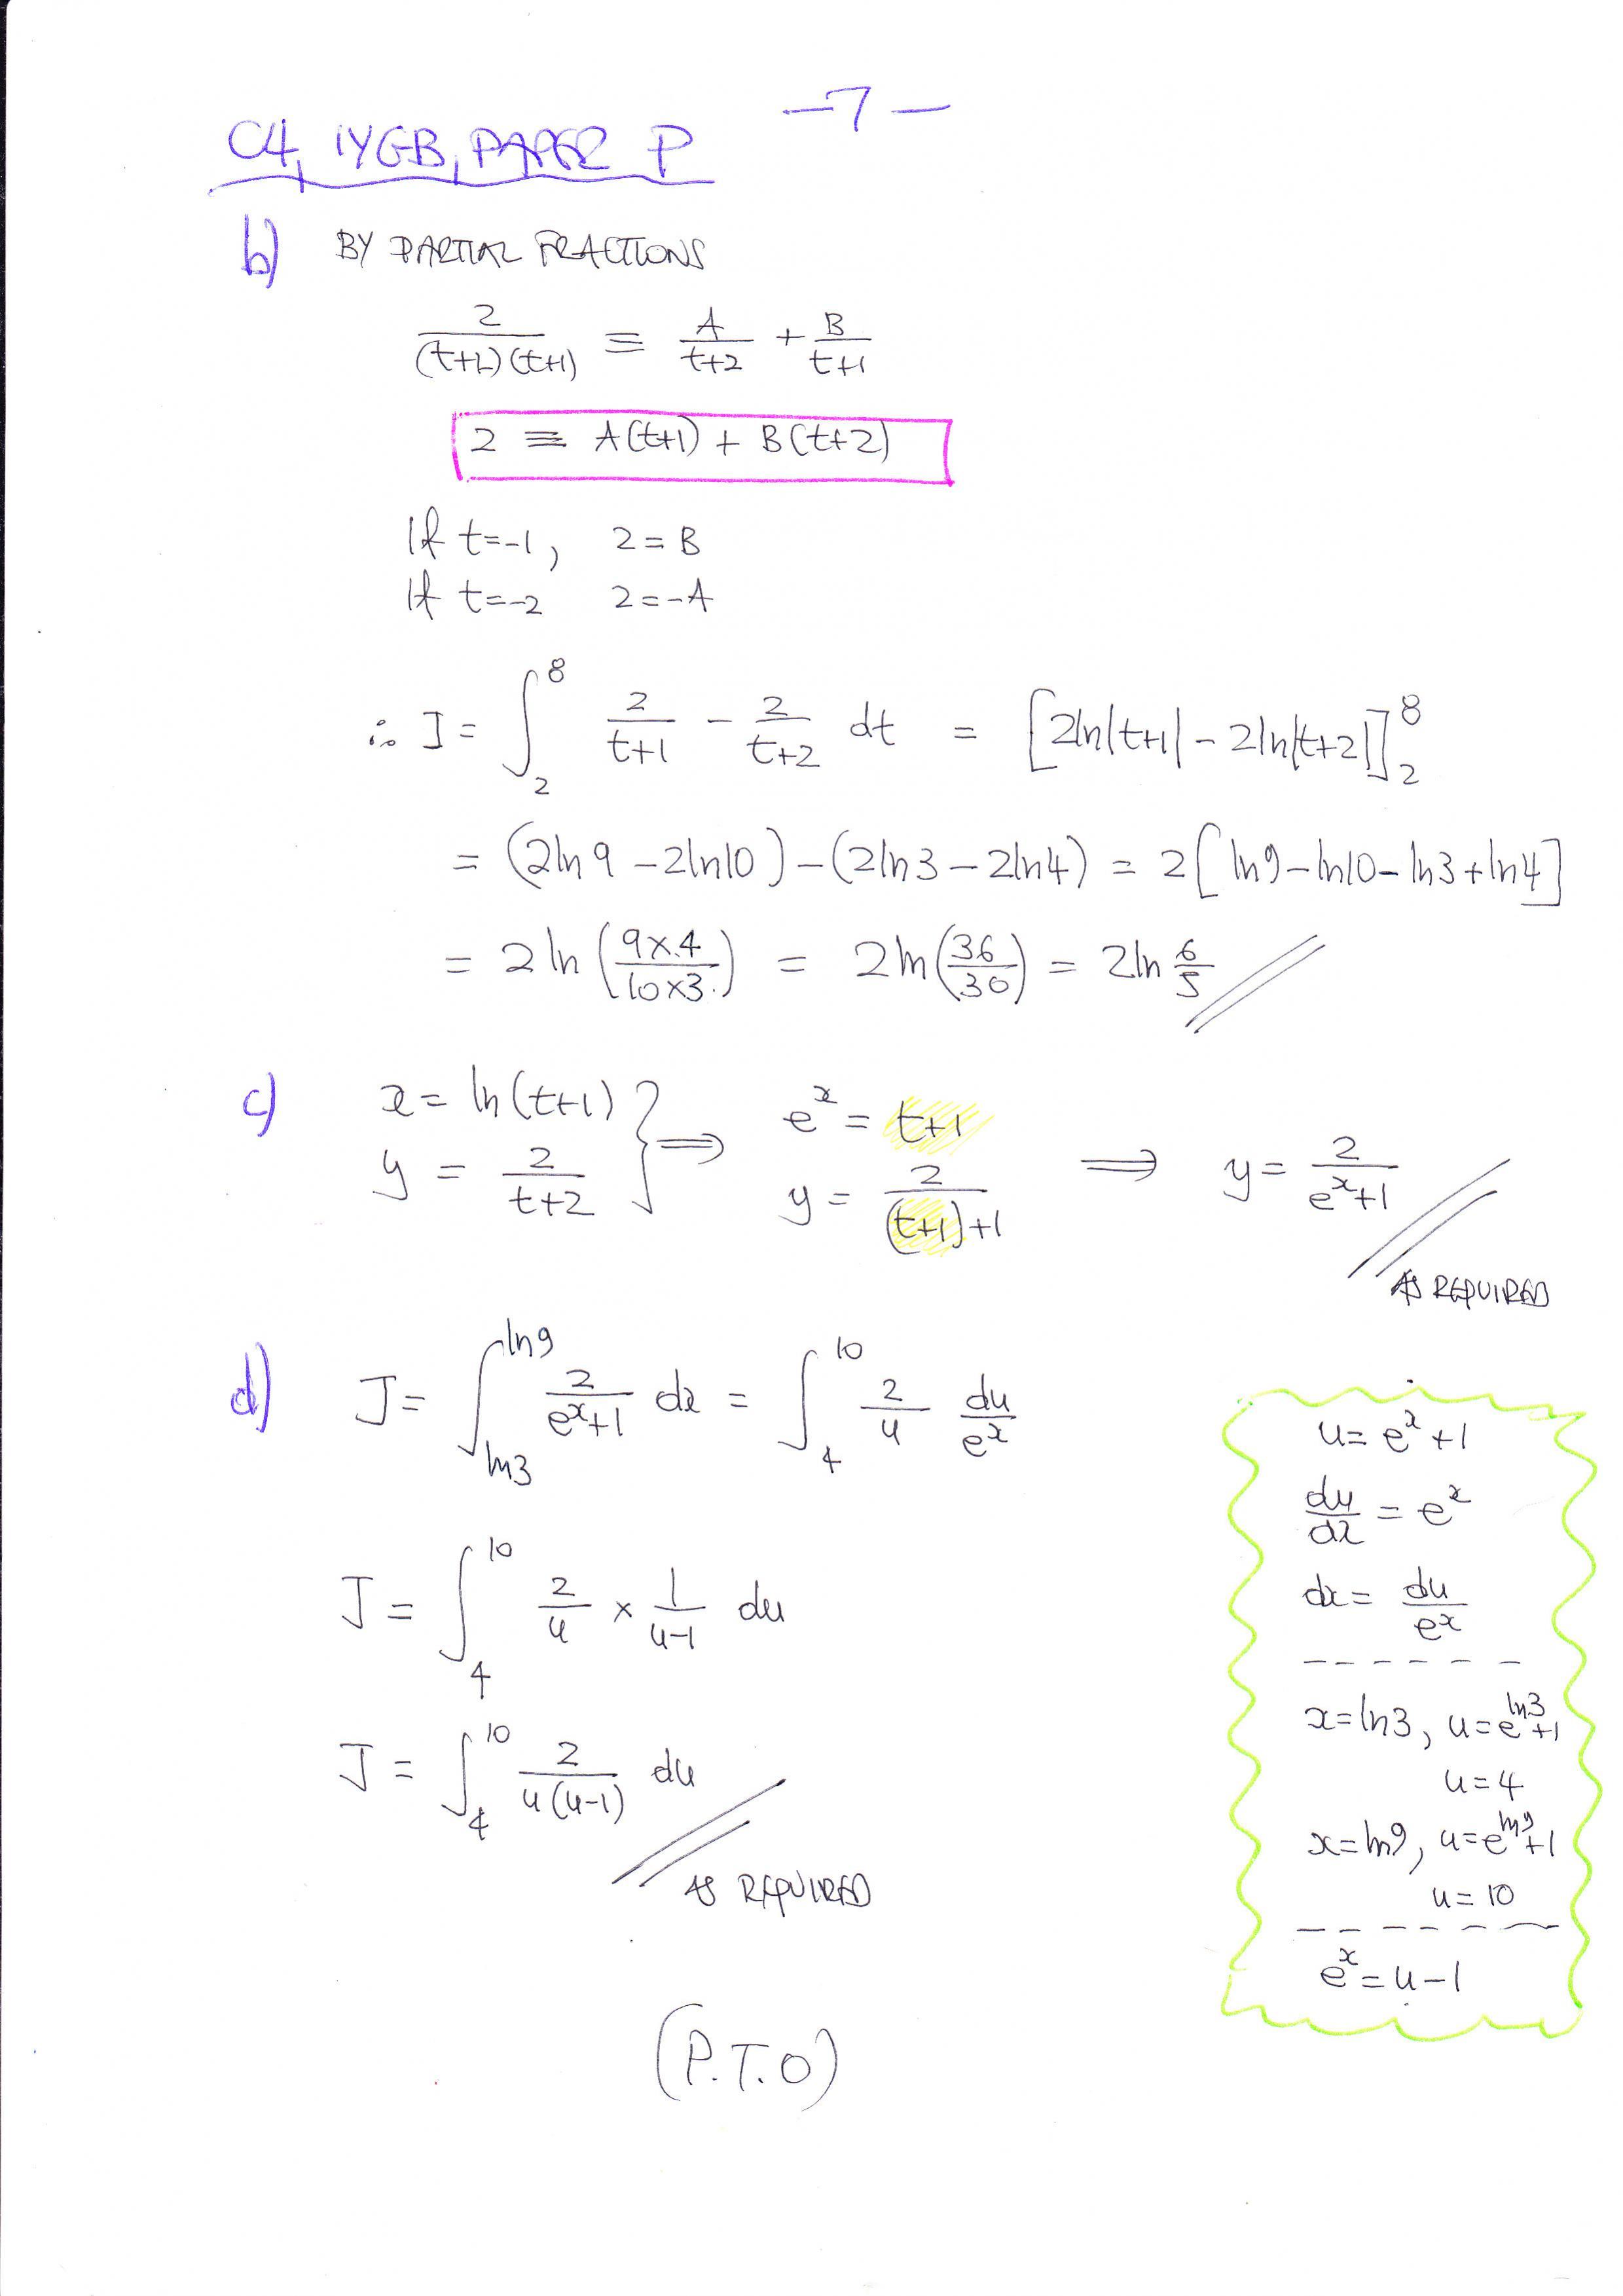 Name:  C4, IYGB, Paper P, page 7.jpg Views: 86 Size:  333.8 KB